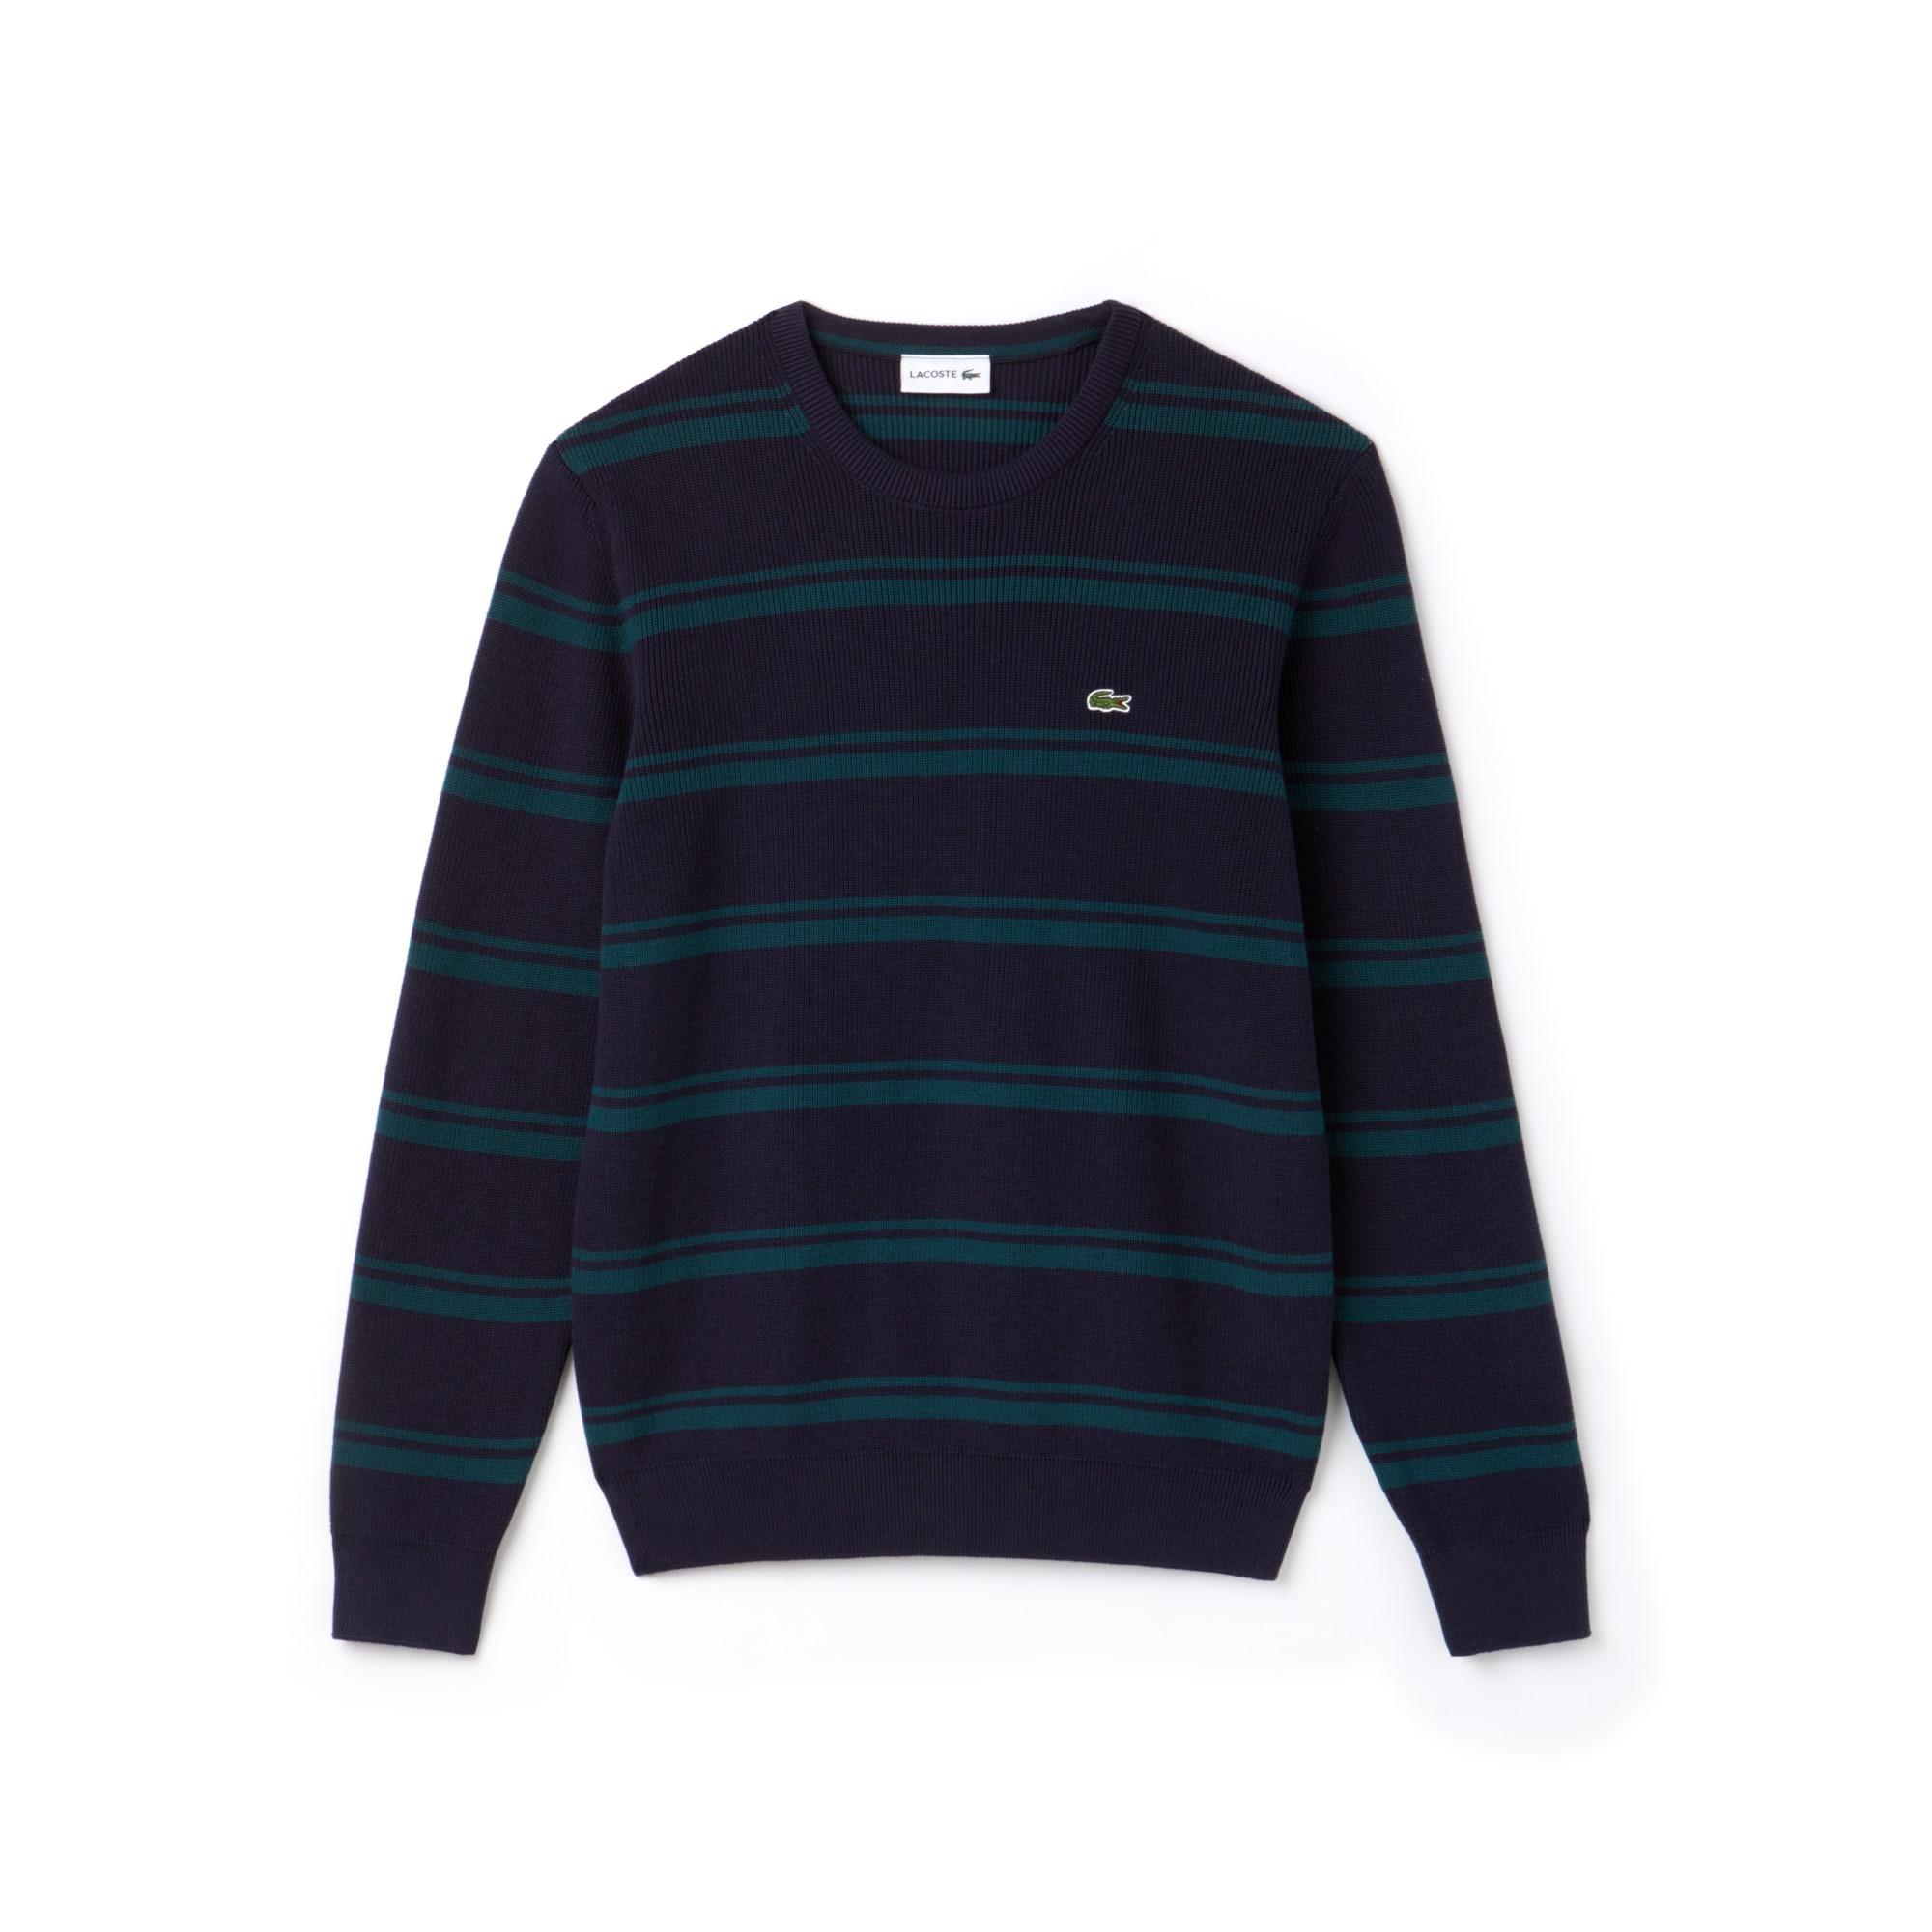 Men's Crew Neck Striped Ribbed Cotton Sweater